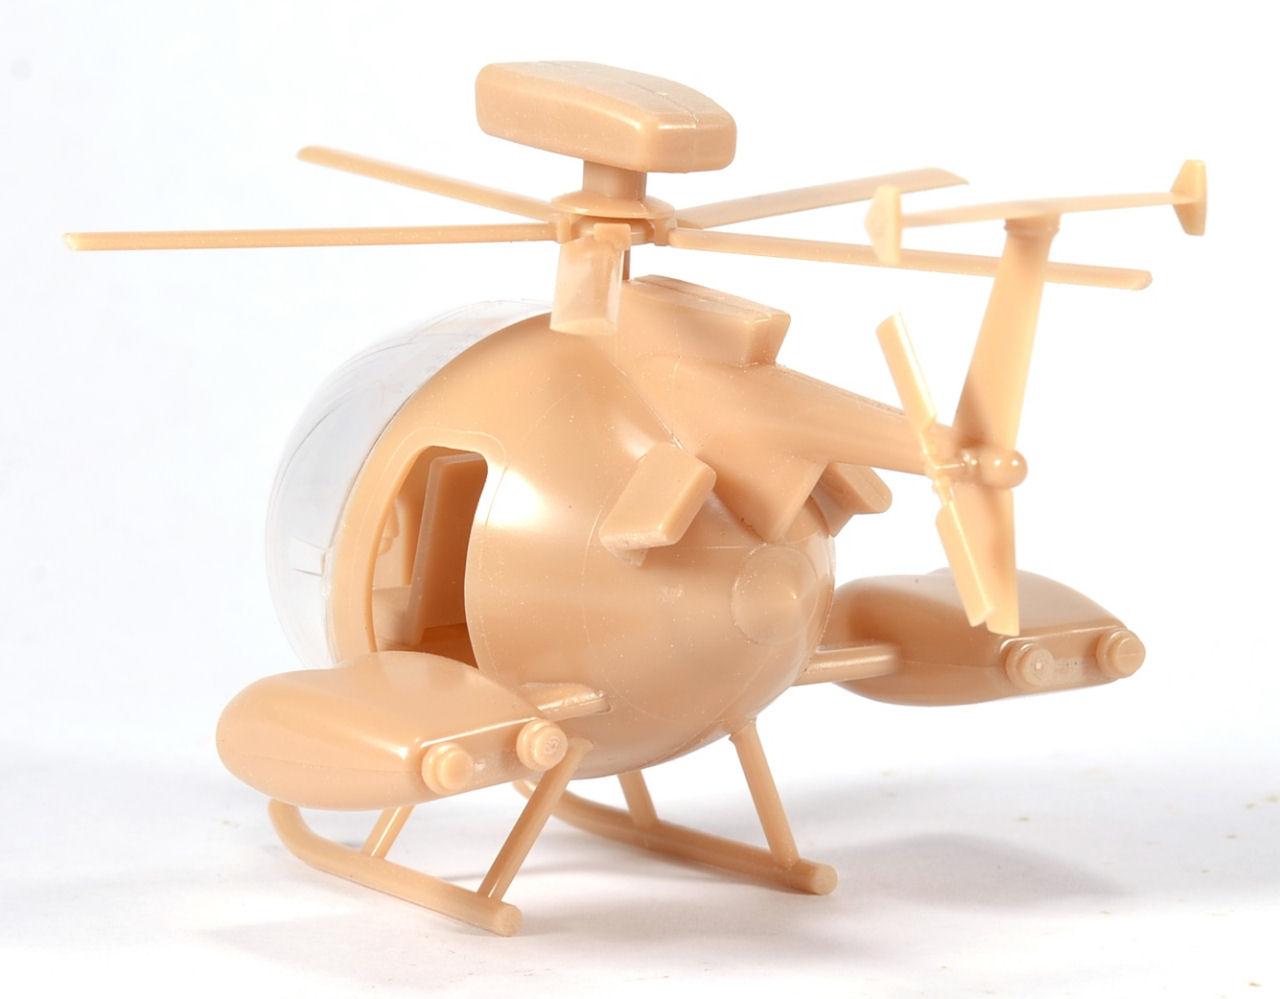 Hughes 500 Hasegawa Egg Plane Series